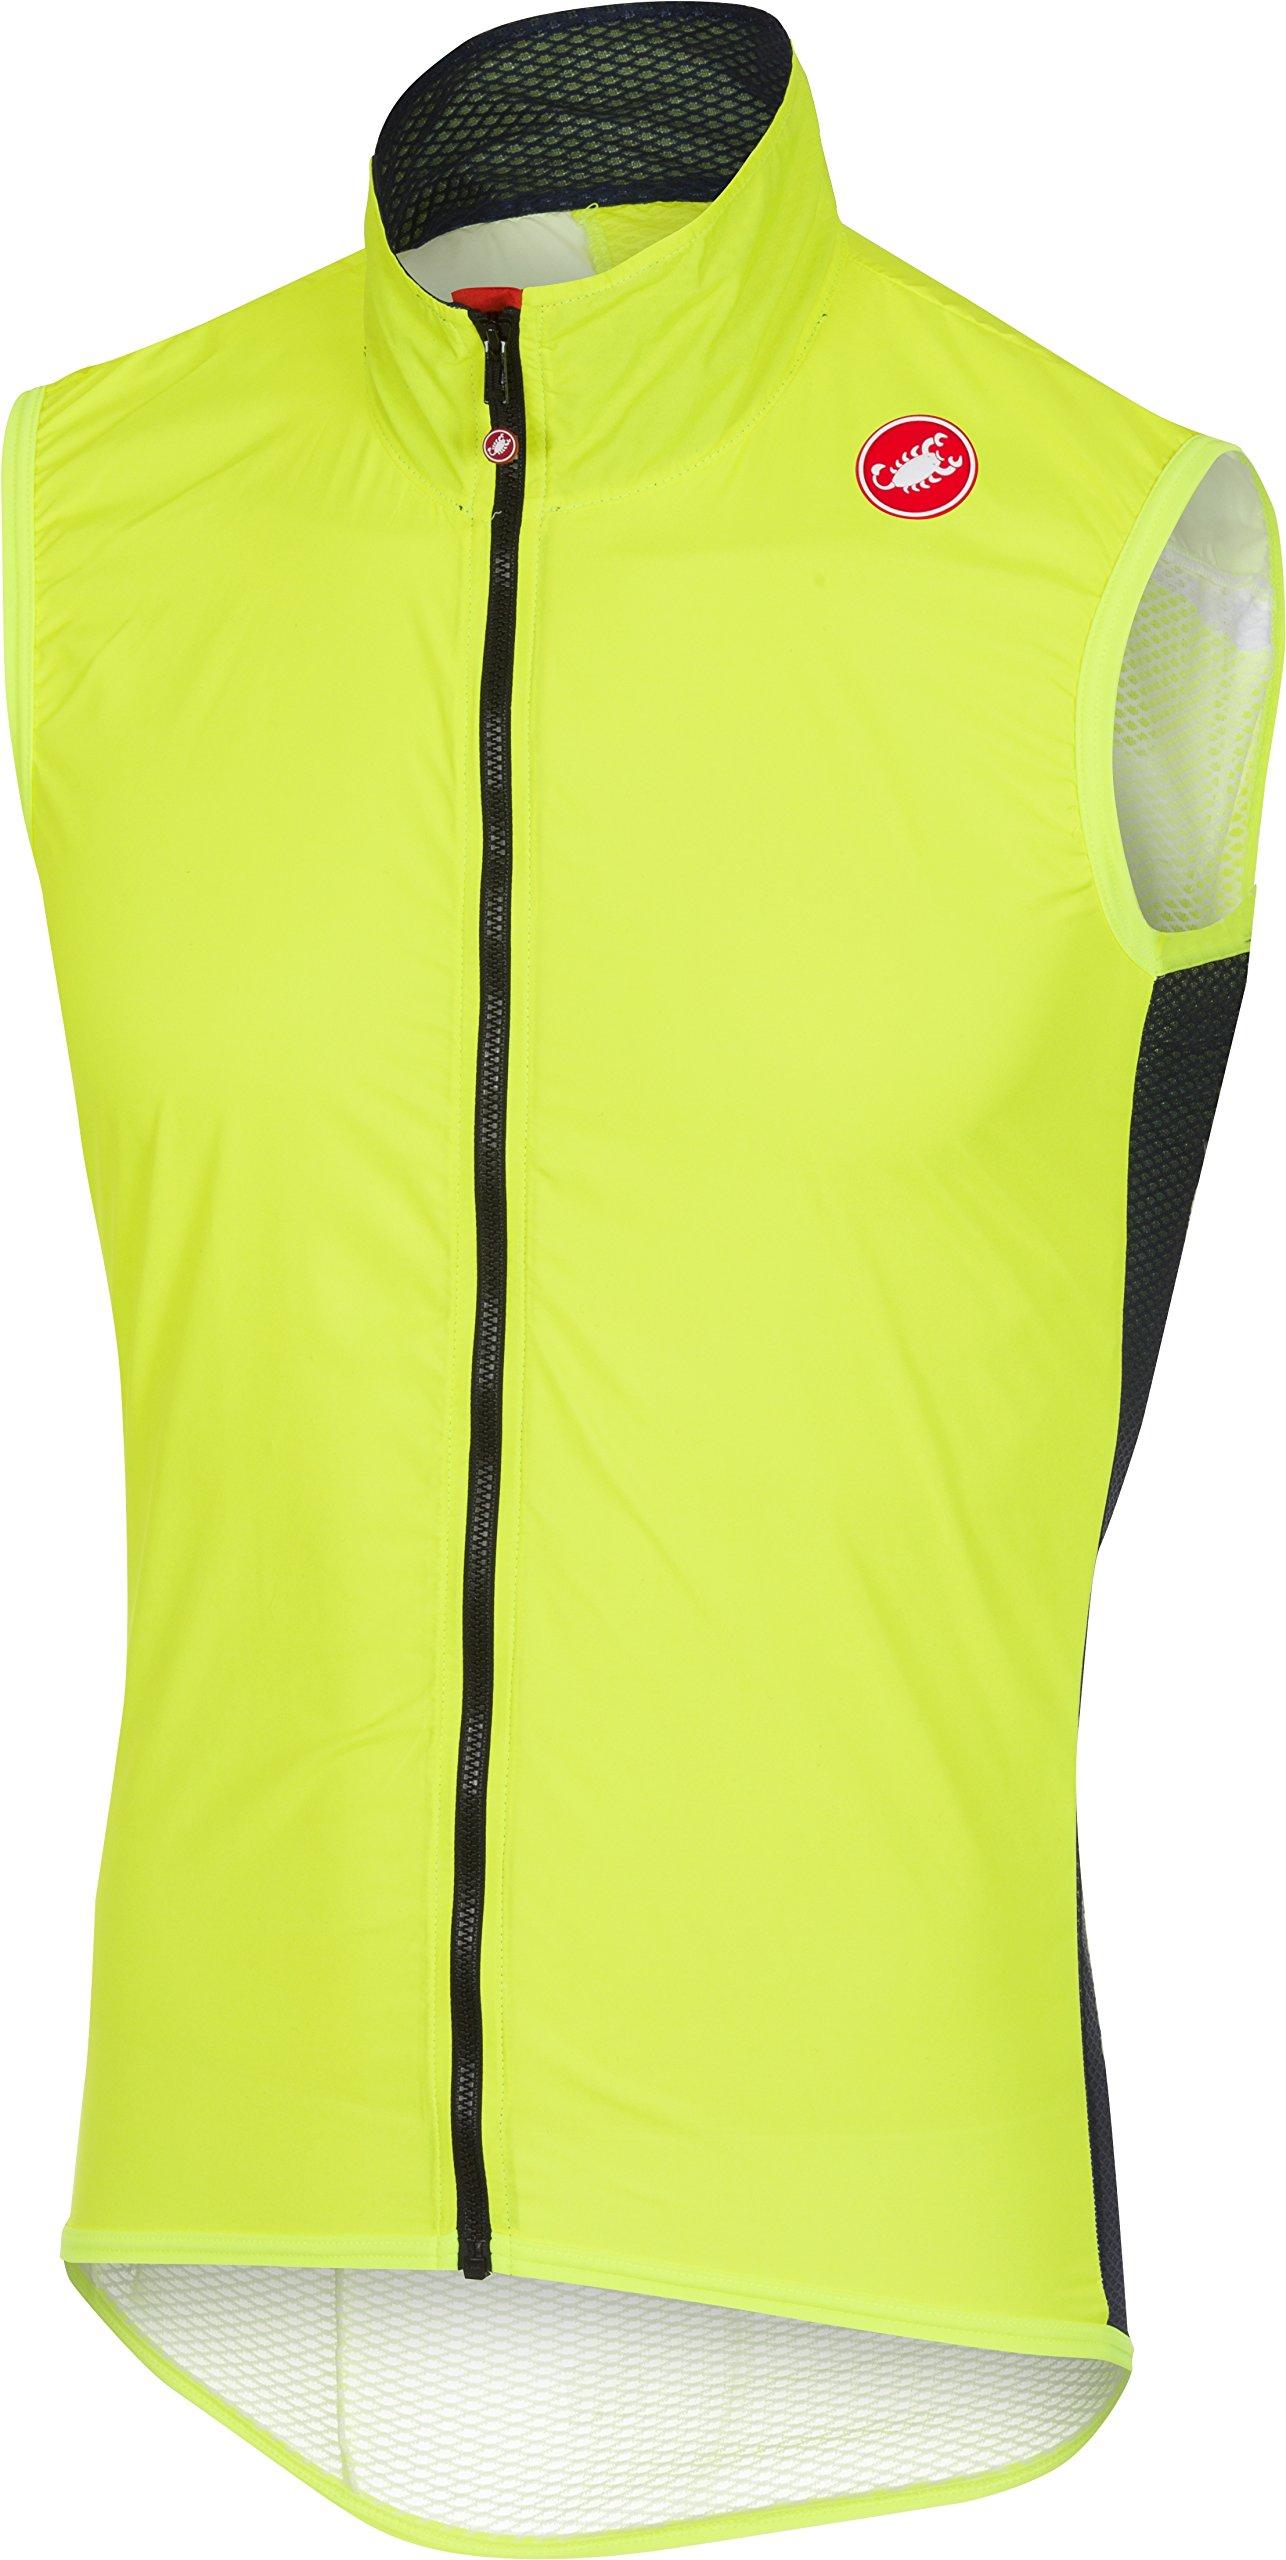 Castelli Pro Light Wind Vest - Men's Yellow Fluo, XXL by Castelli